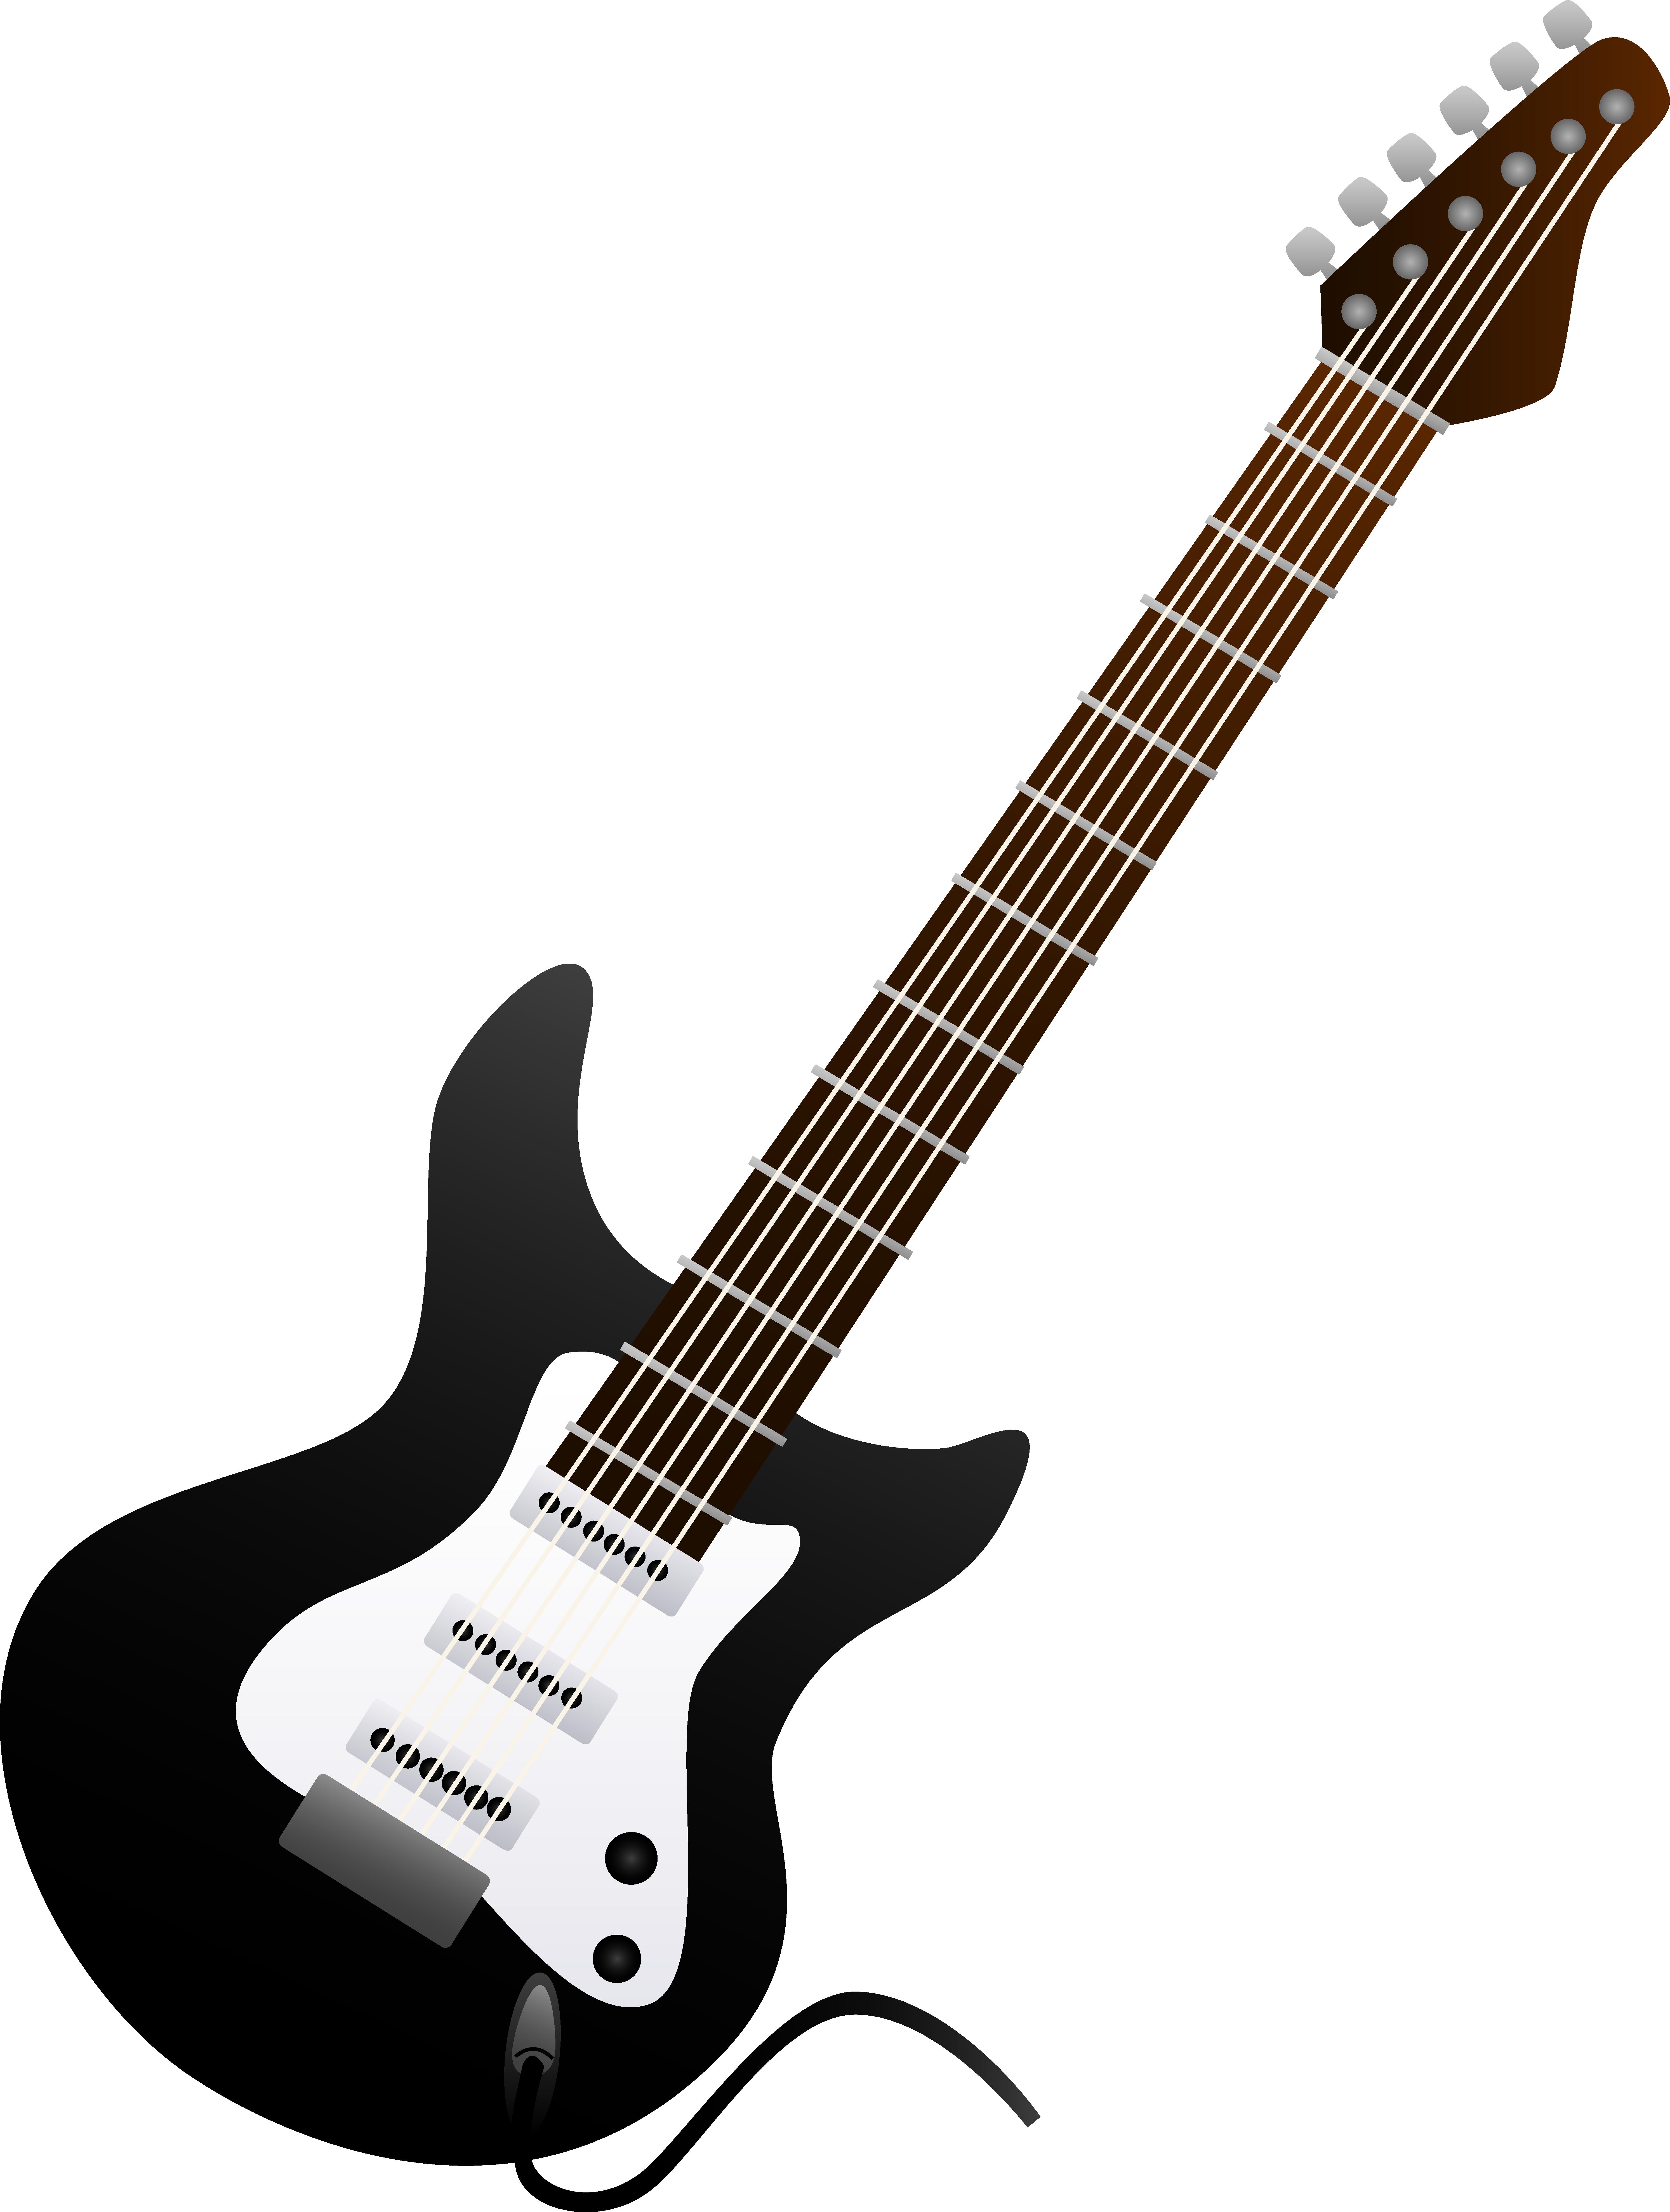 5971x7908 Acoustic Guitar Clipart Clip Art